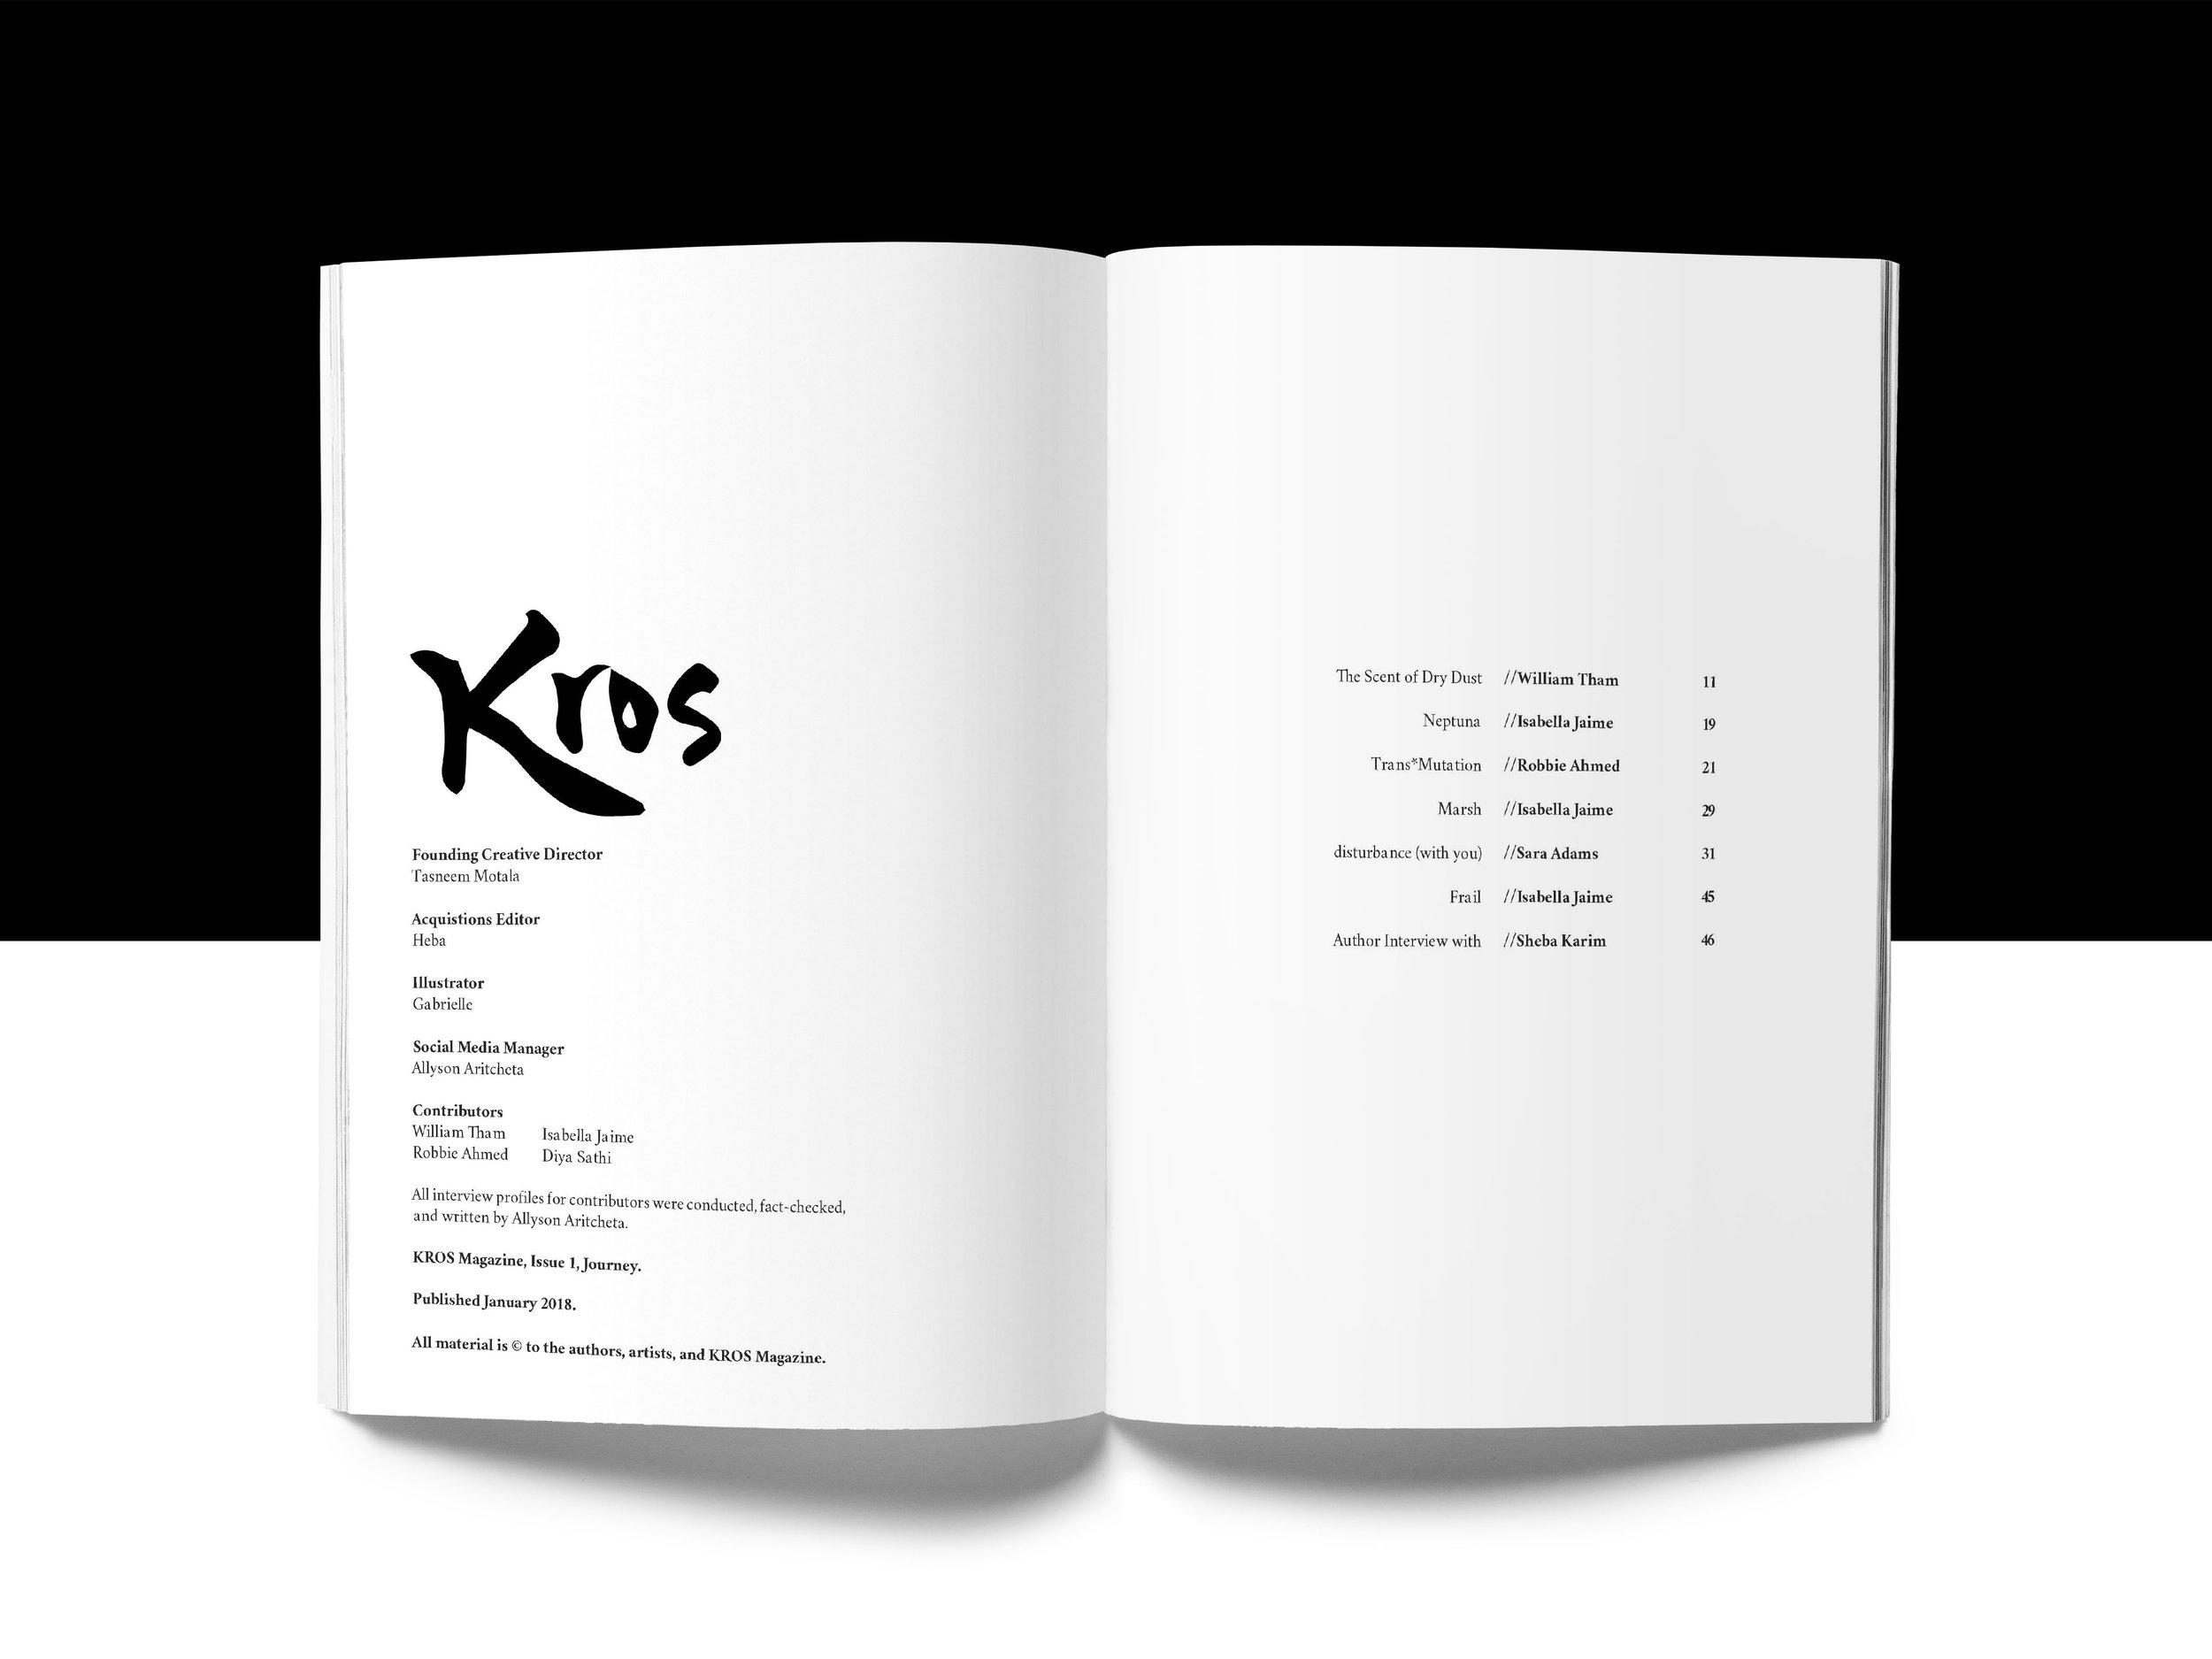 KROS_Spread01.JPG